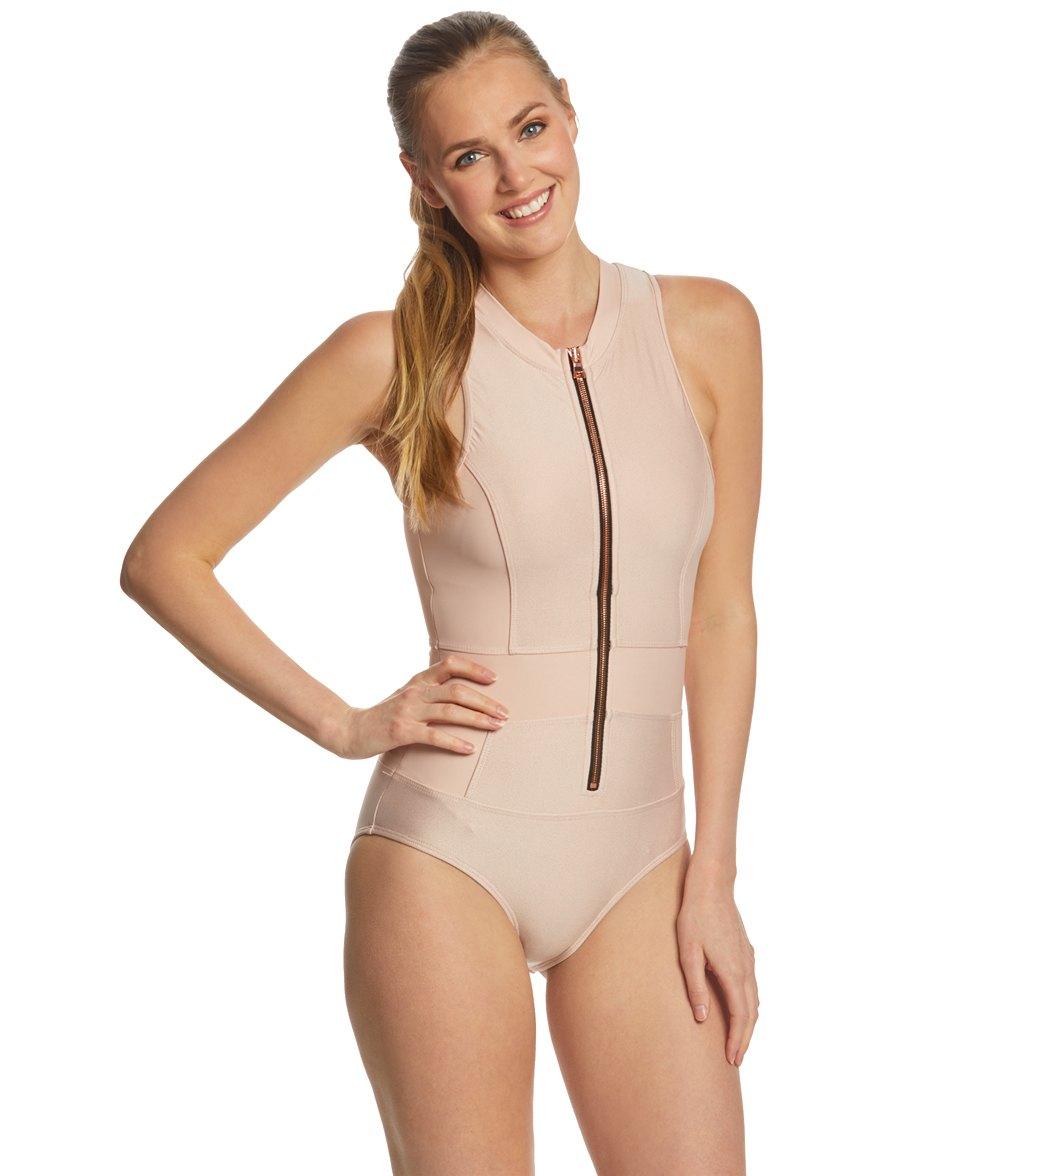 194a6cc63f Next Feeling Fine Malibu Tank One Piece Swimsuit at SwimOutlet.com - Free  Shipping